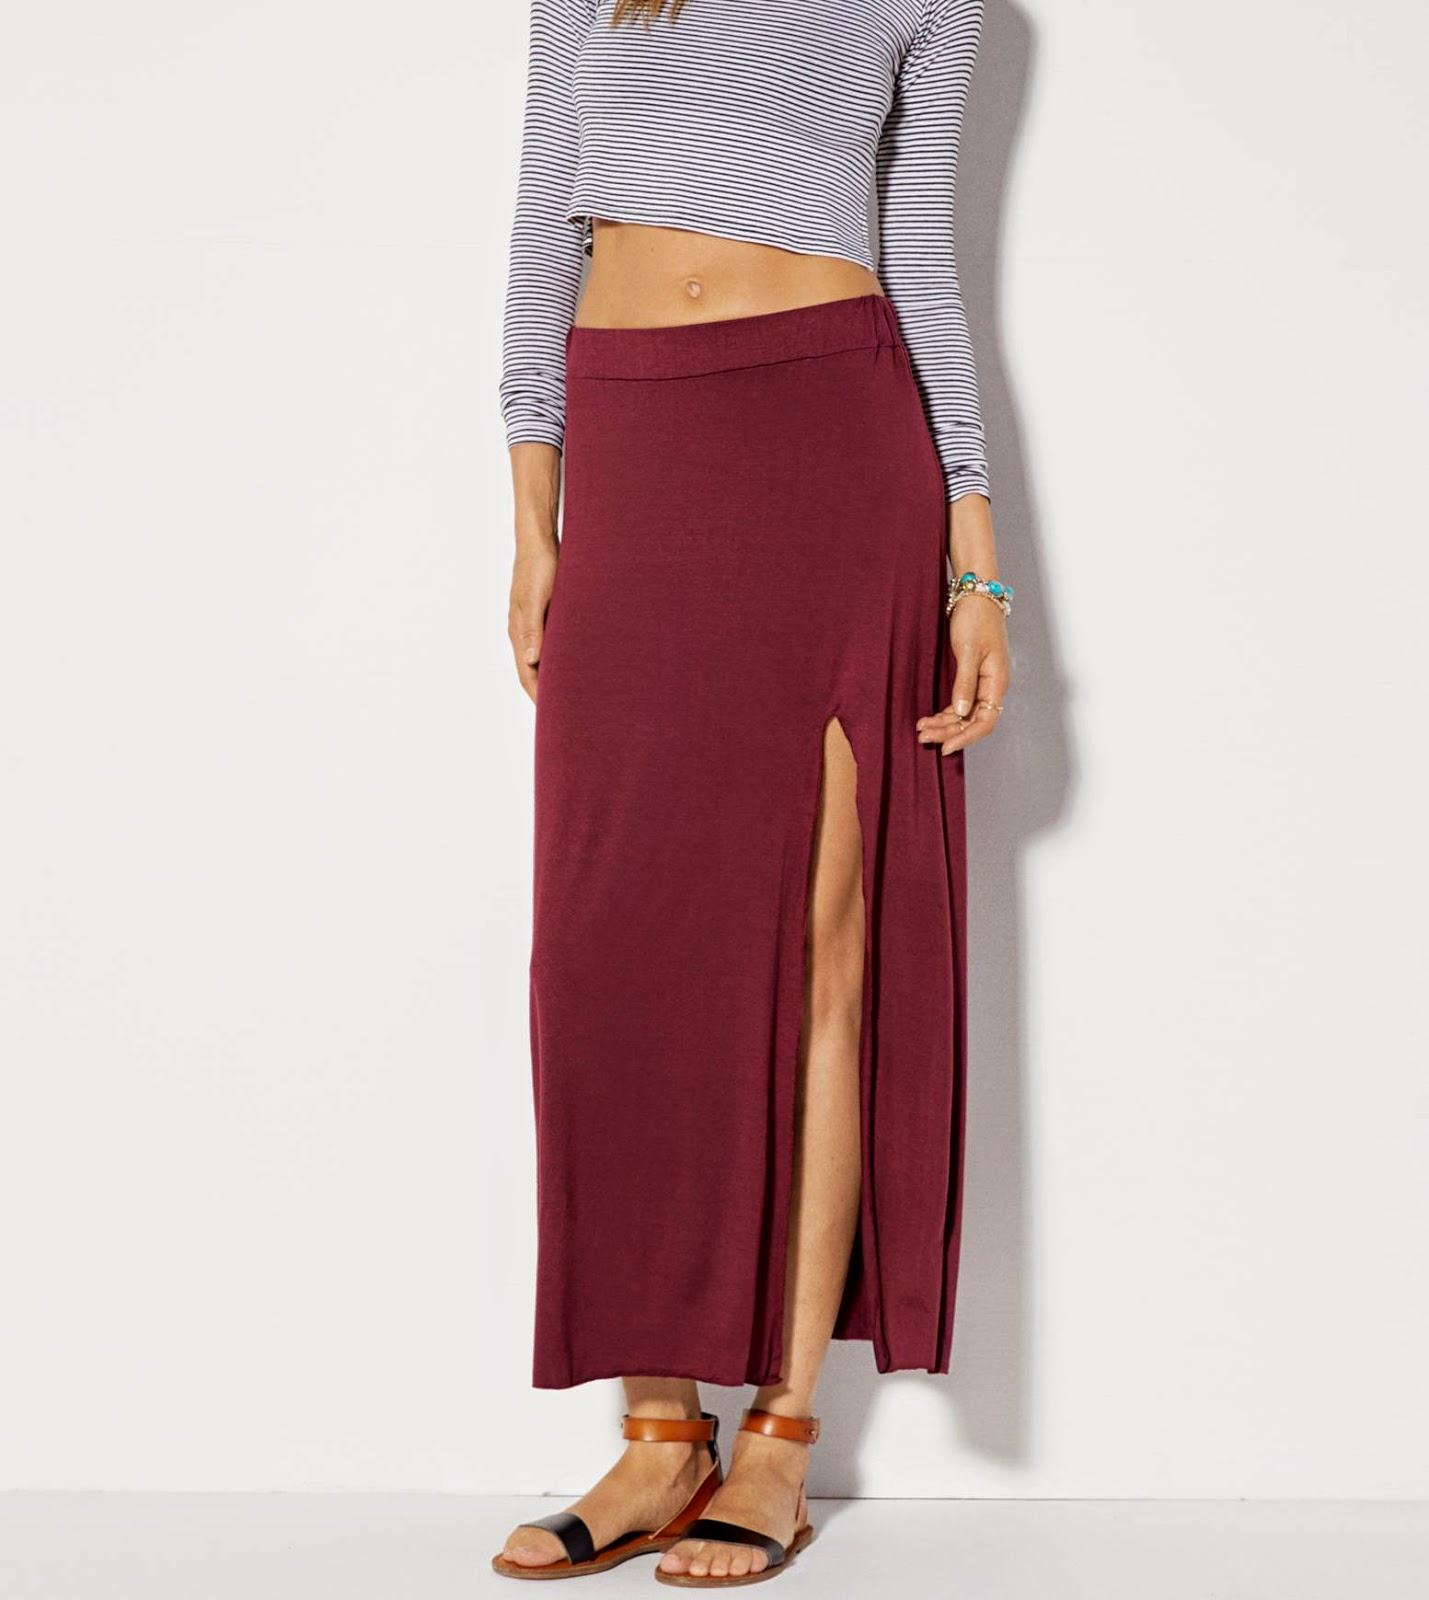 party product layers cm line floor petticoat dress skirt tulle a skirts midi floors long women length